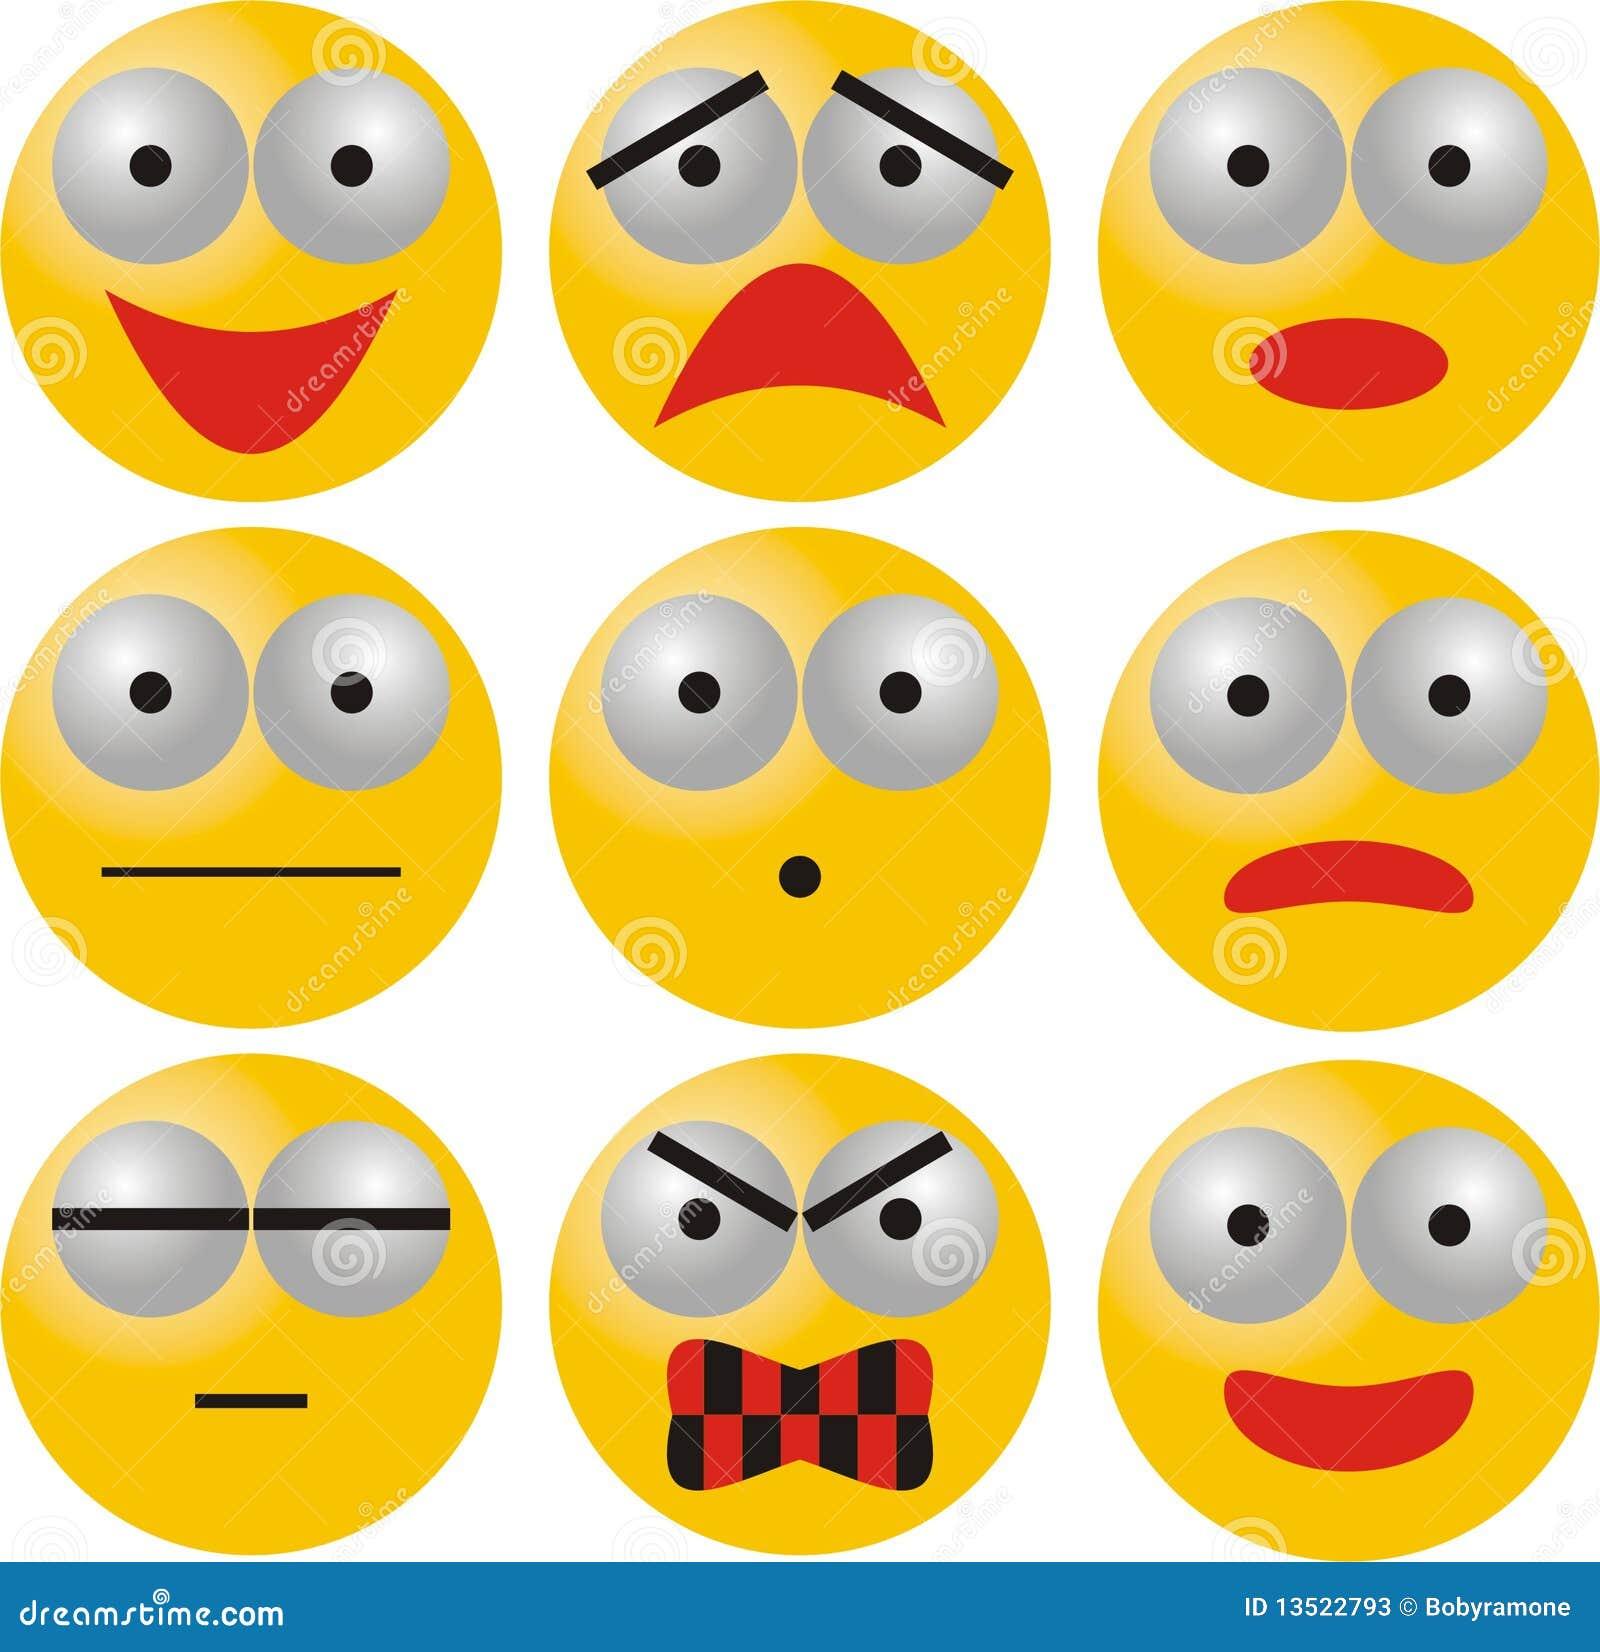 Emotions Stock Photos - Image: 13522793